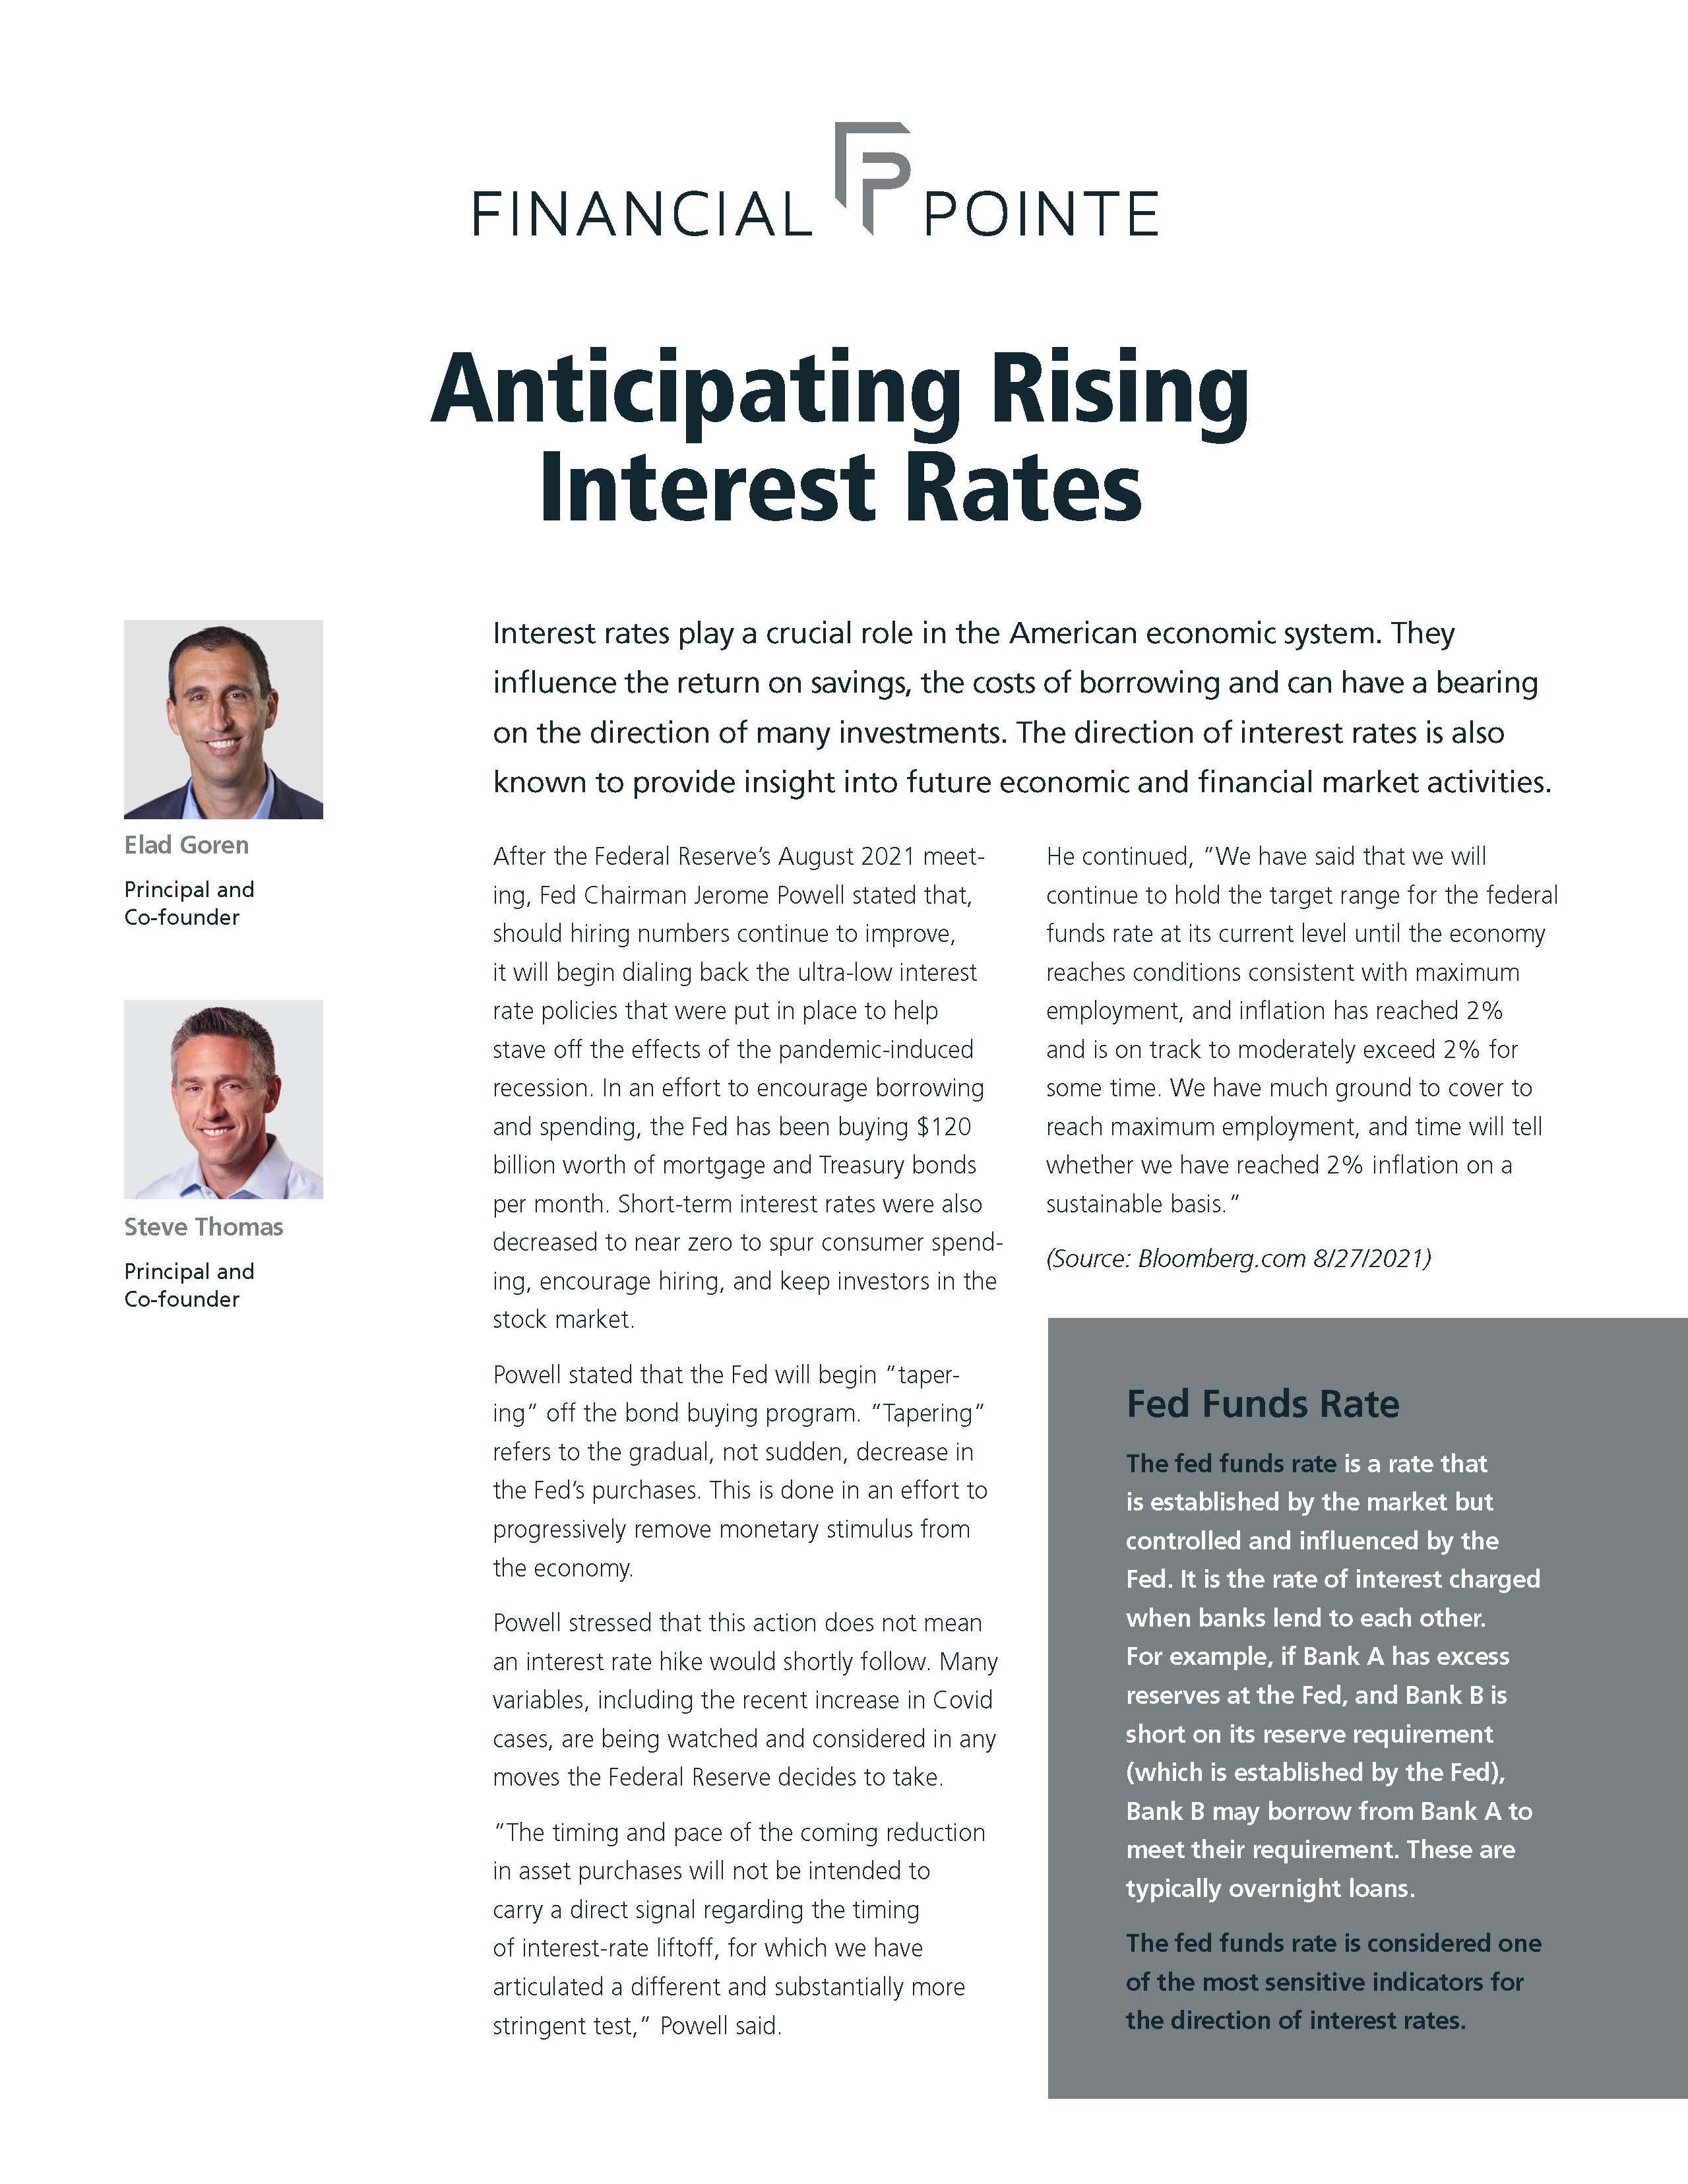 Anticipating Rising Interest Rates Thumbnail